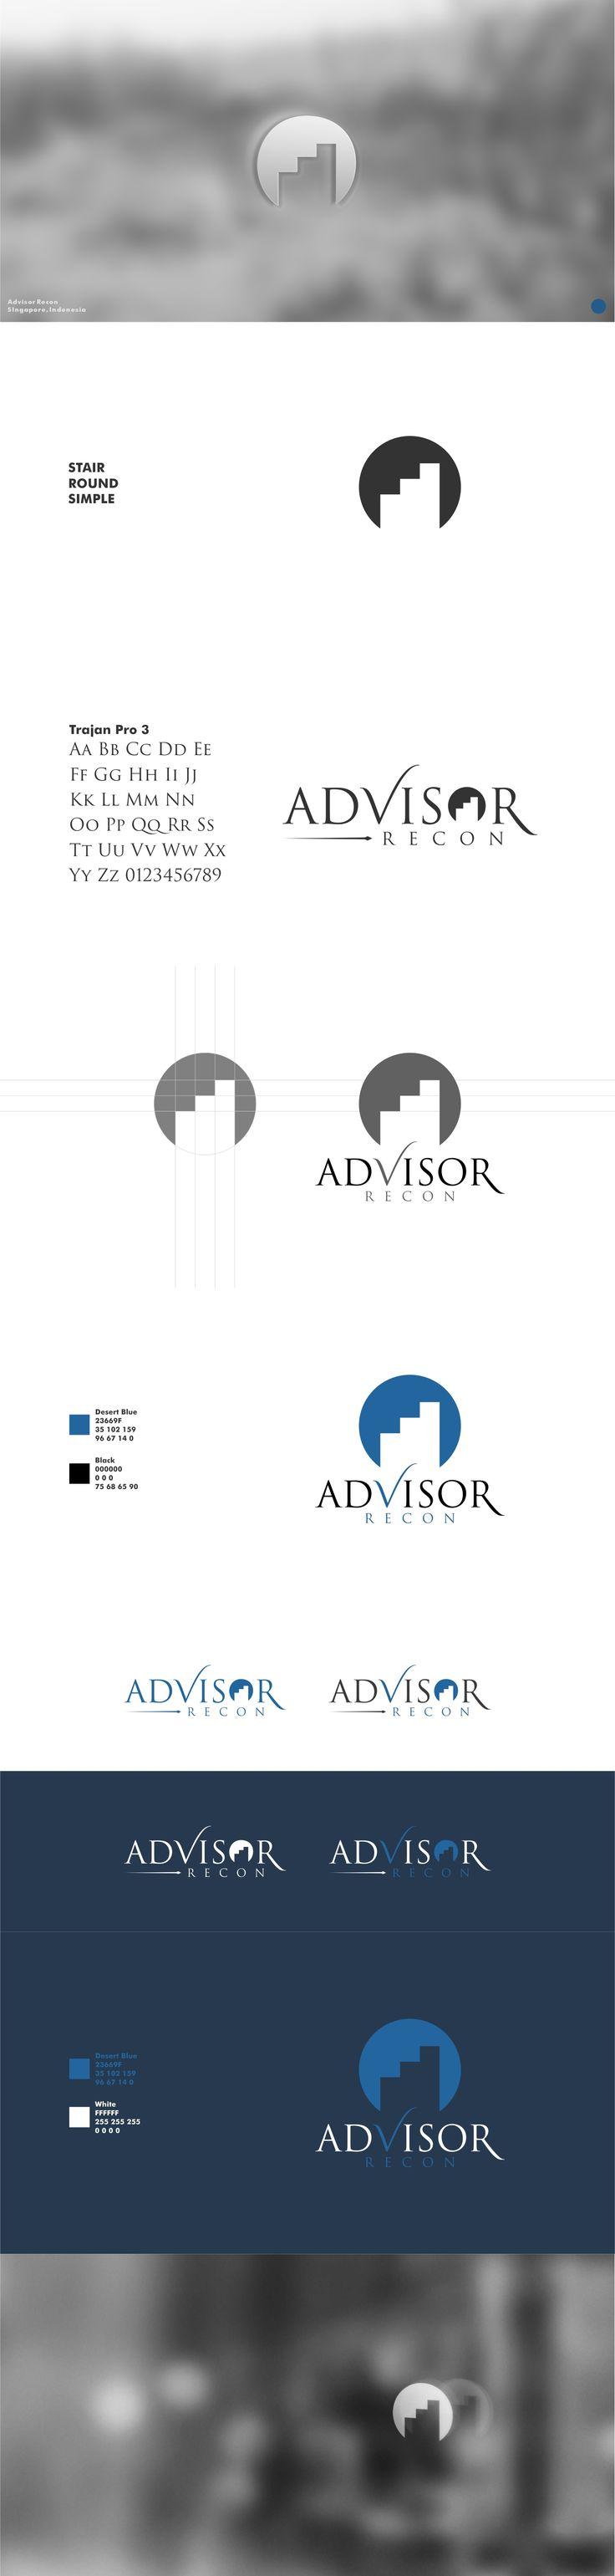 Advisor Recon  - Visual Identity #visual #identity #visualidentity #logo #graphic #design #graphicdesign #digitalart #presentation #portfolio